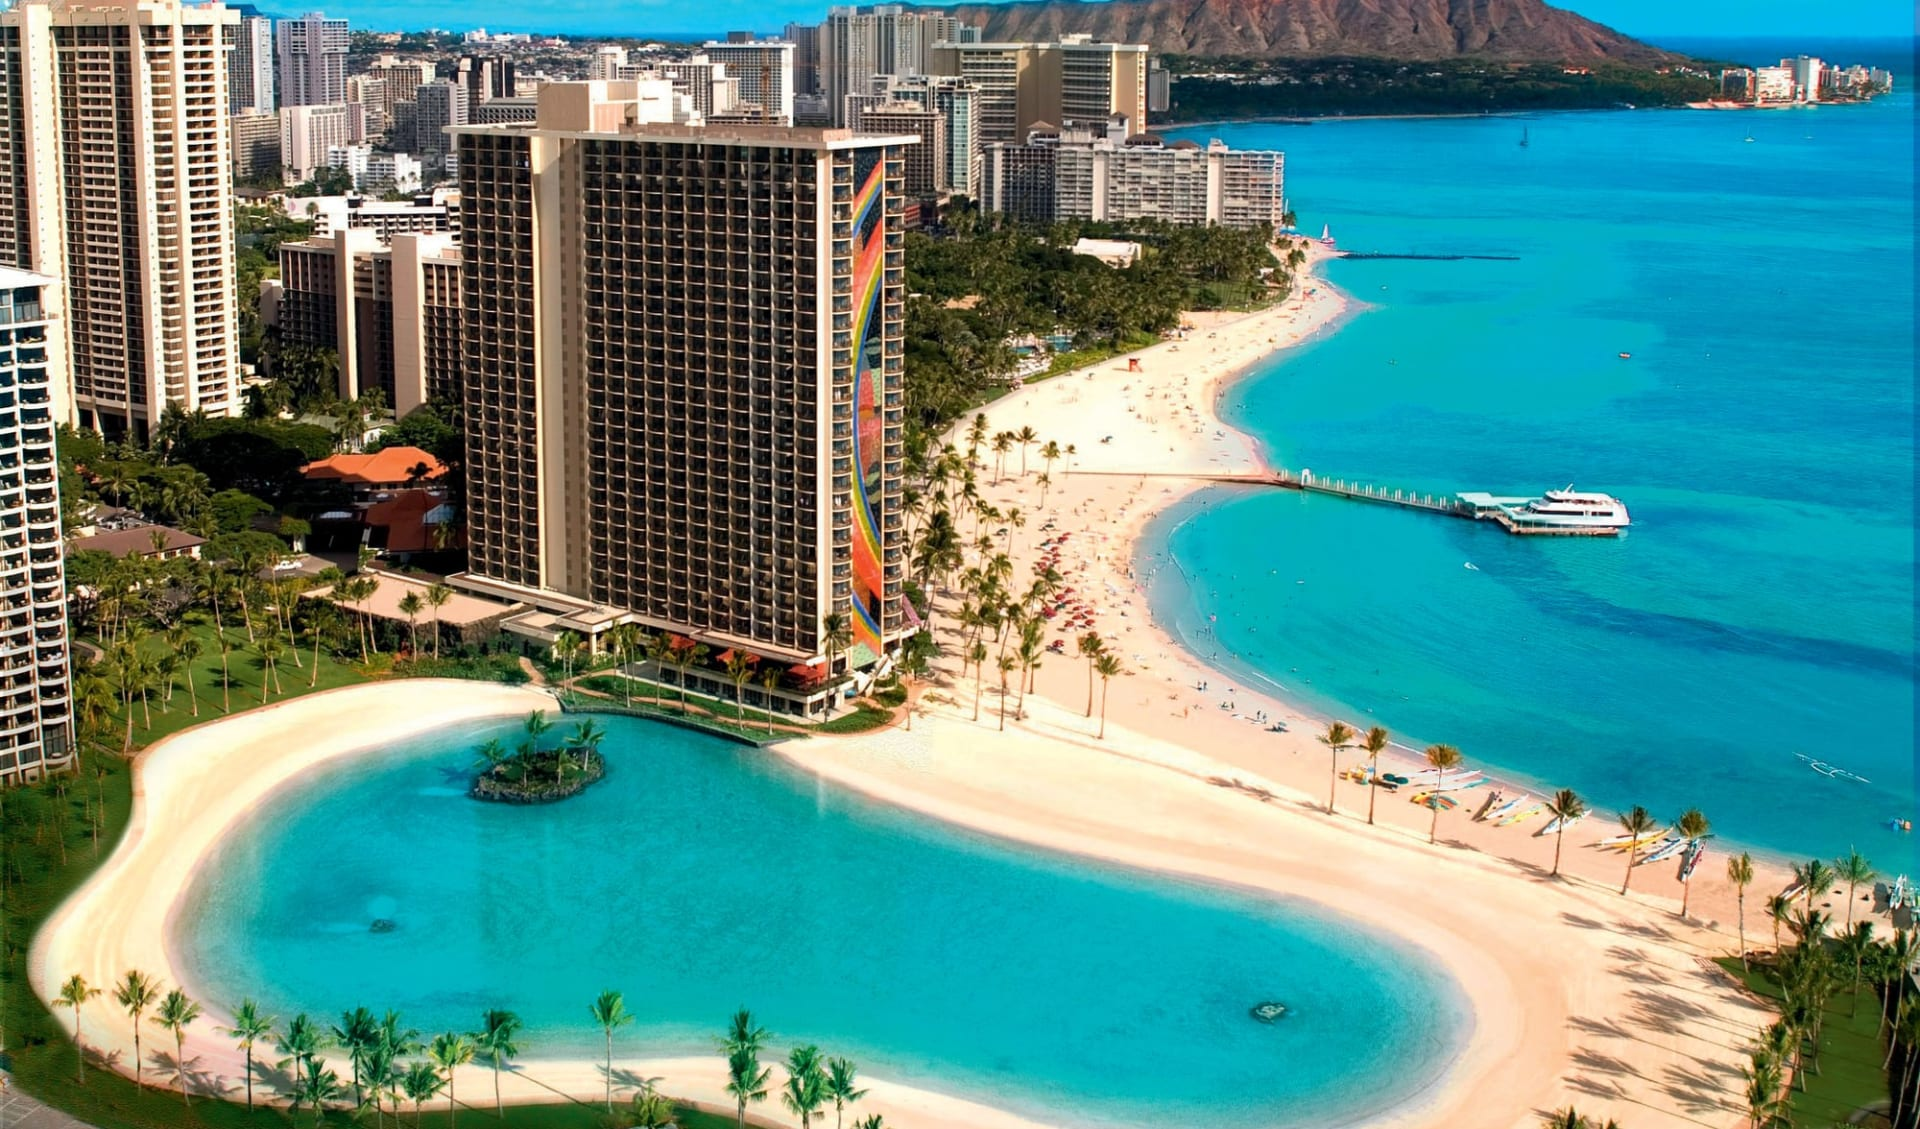 Hilton Hawaiian Village Beach Resort & Spa in Honolulu - Oahu: exterior hilton hawaiian village beach resort and spa hotelanlage strand